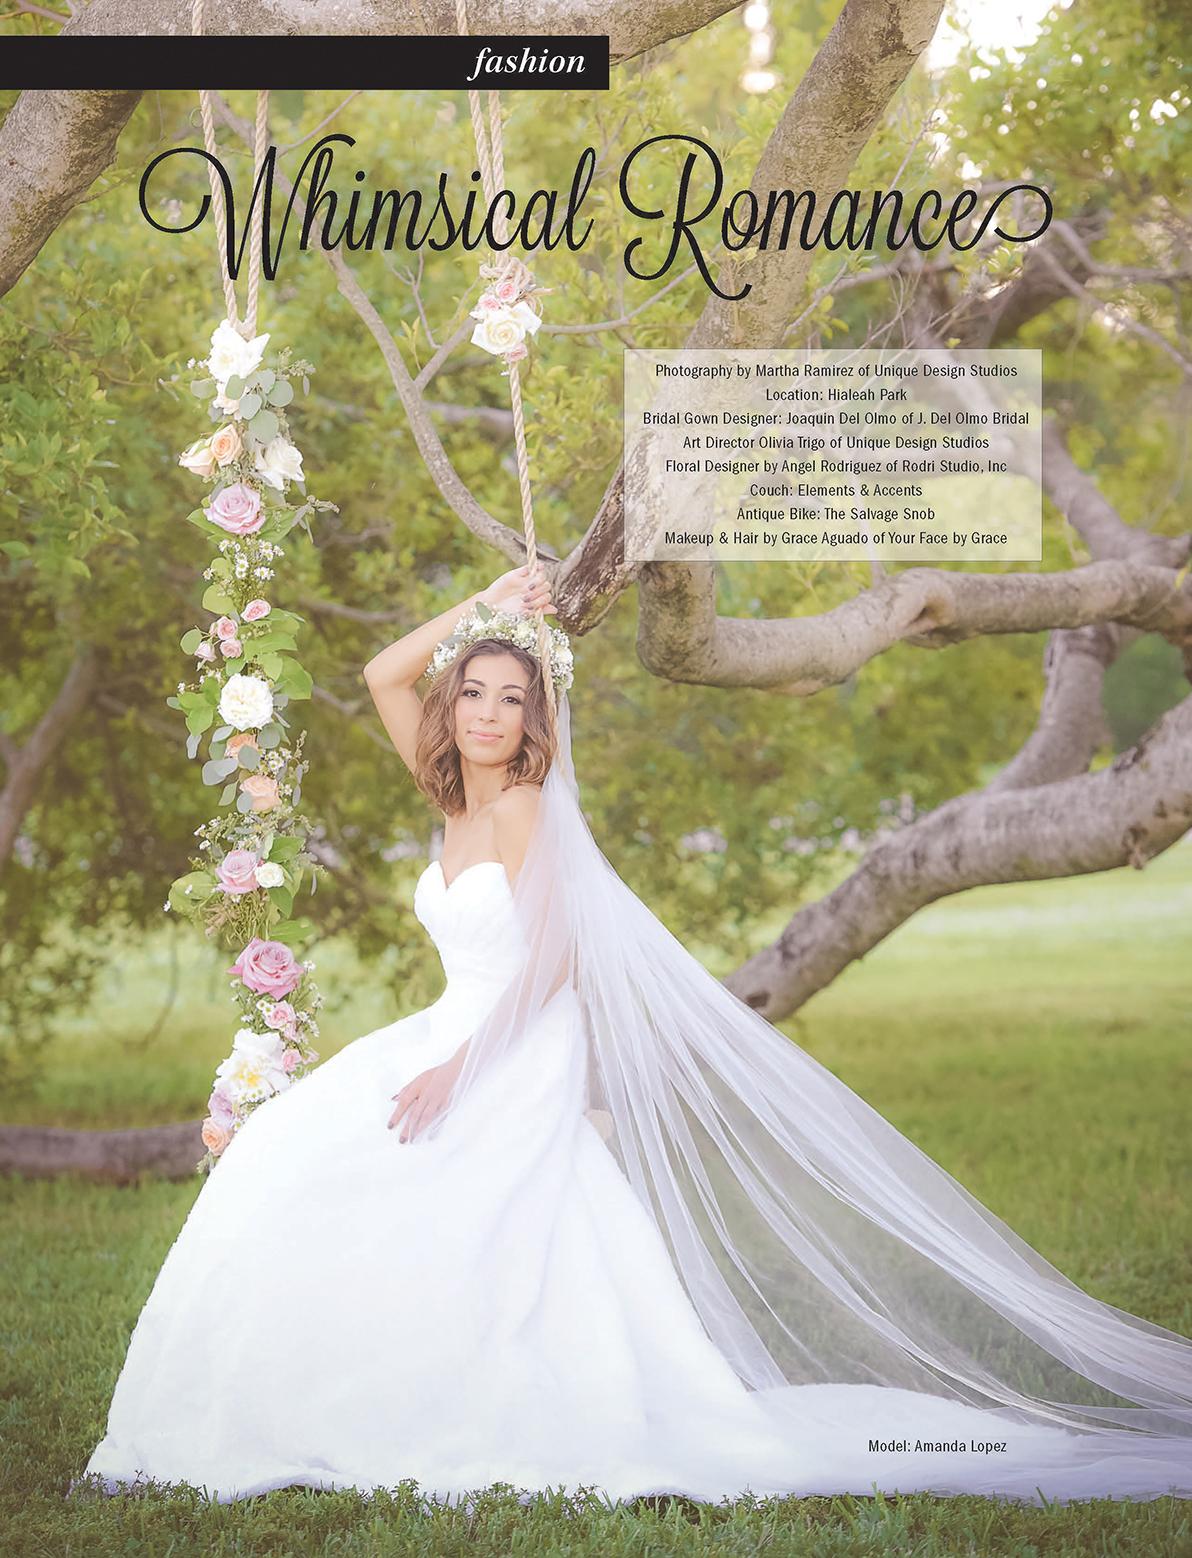 Whimsical Romance | ENCHANTED BRIDES